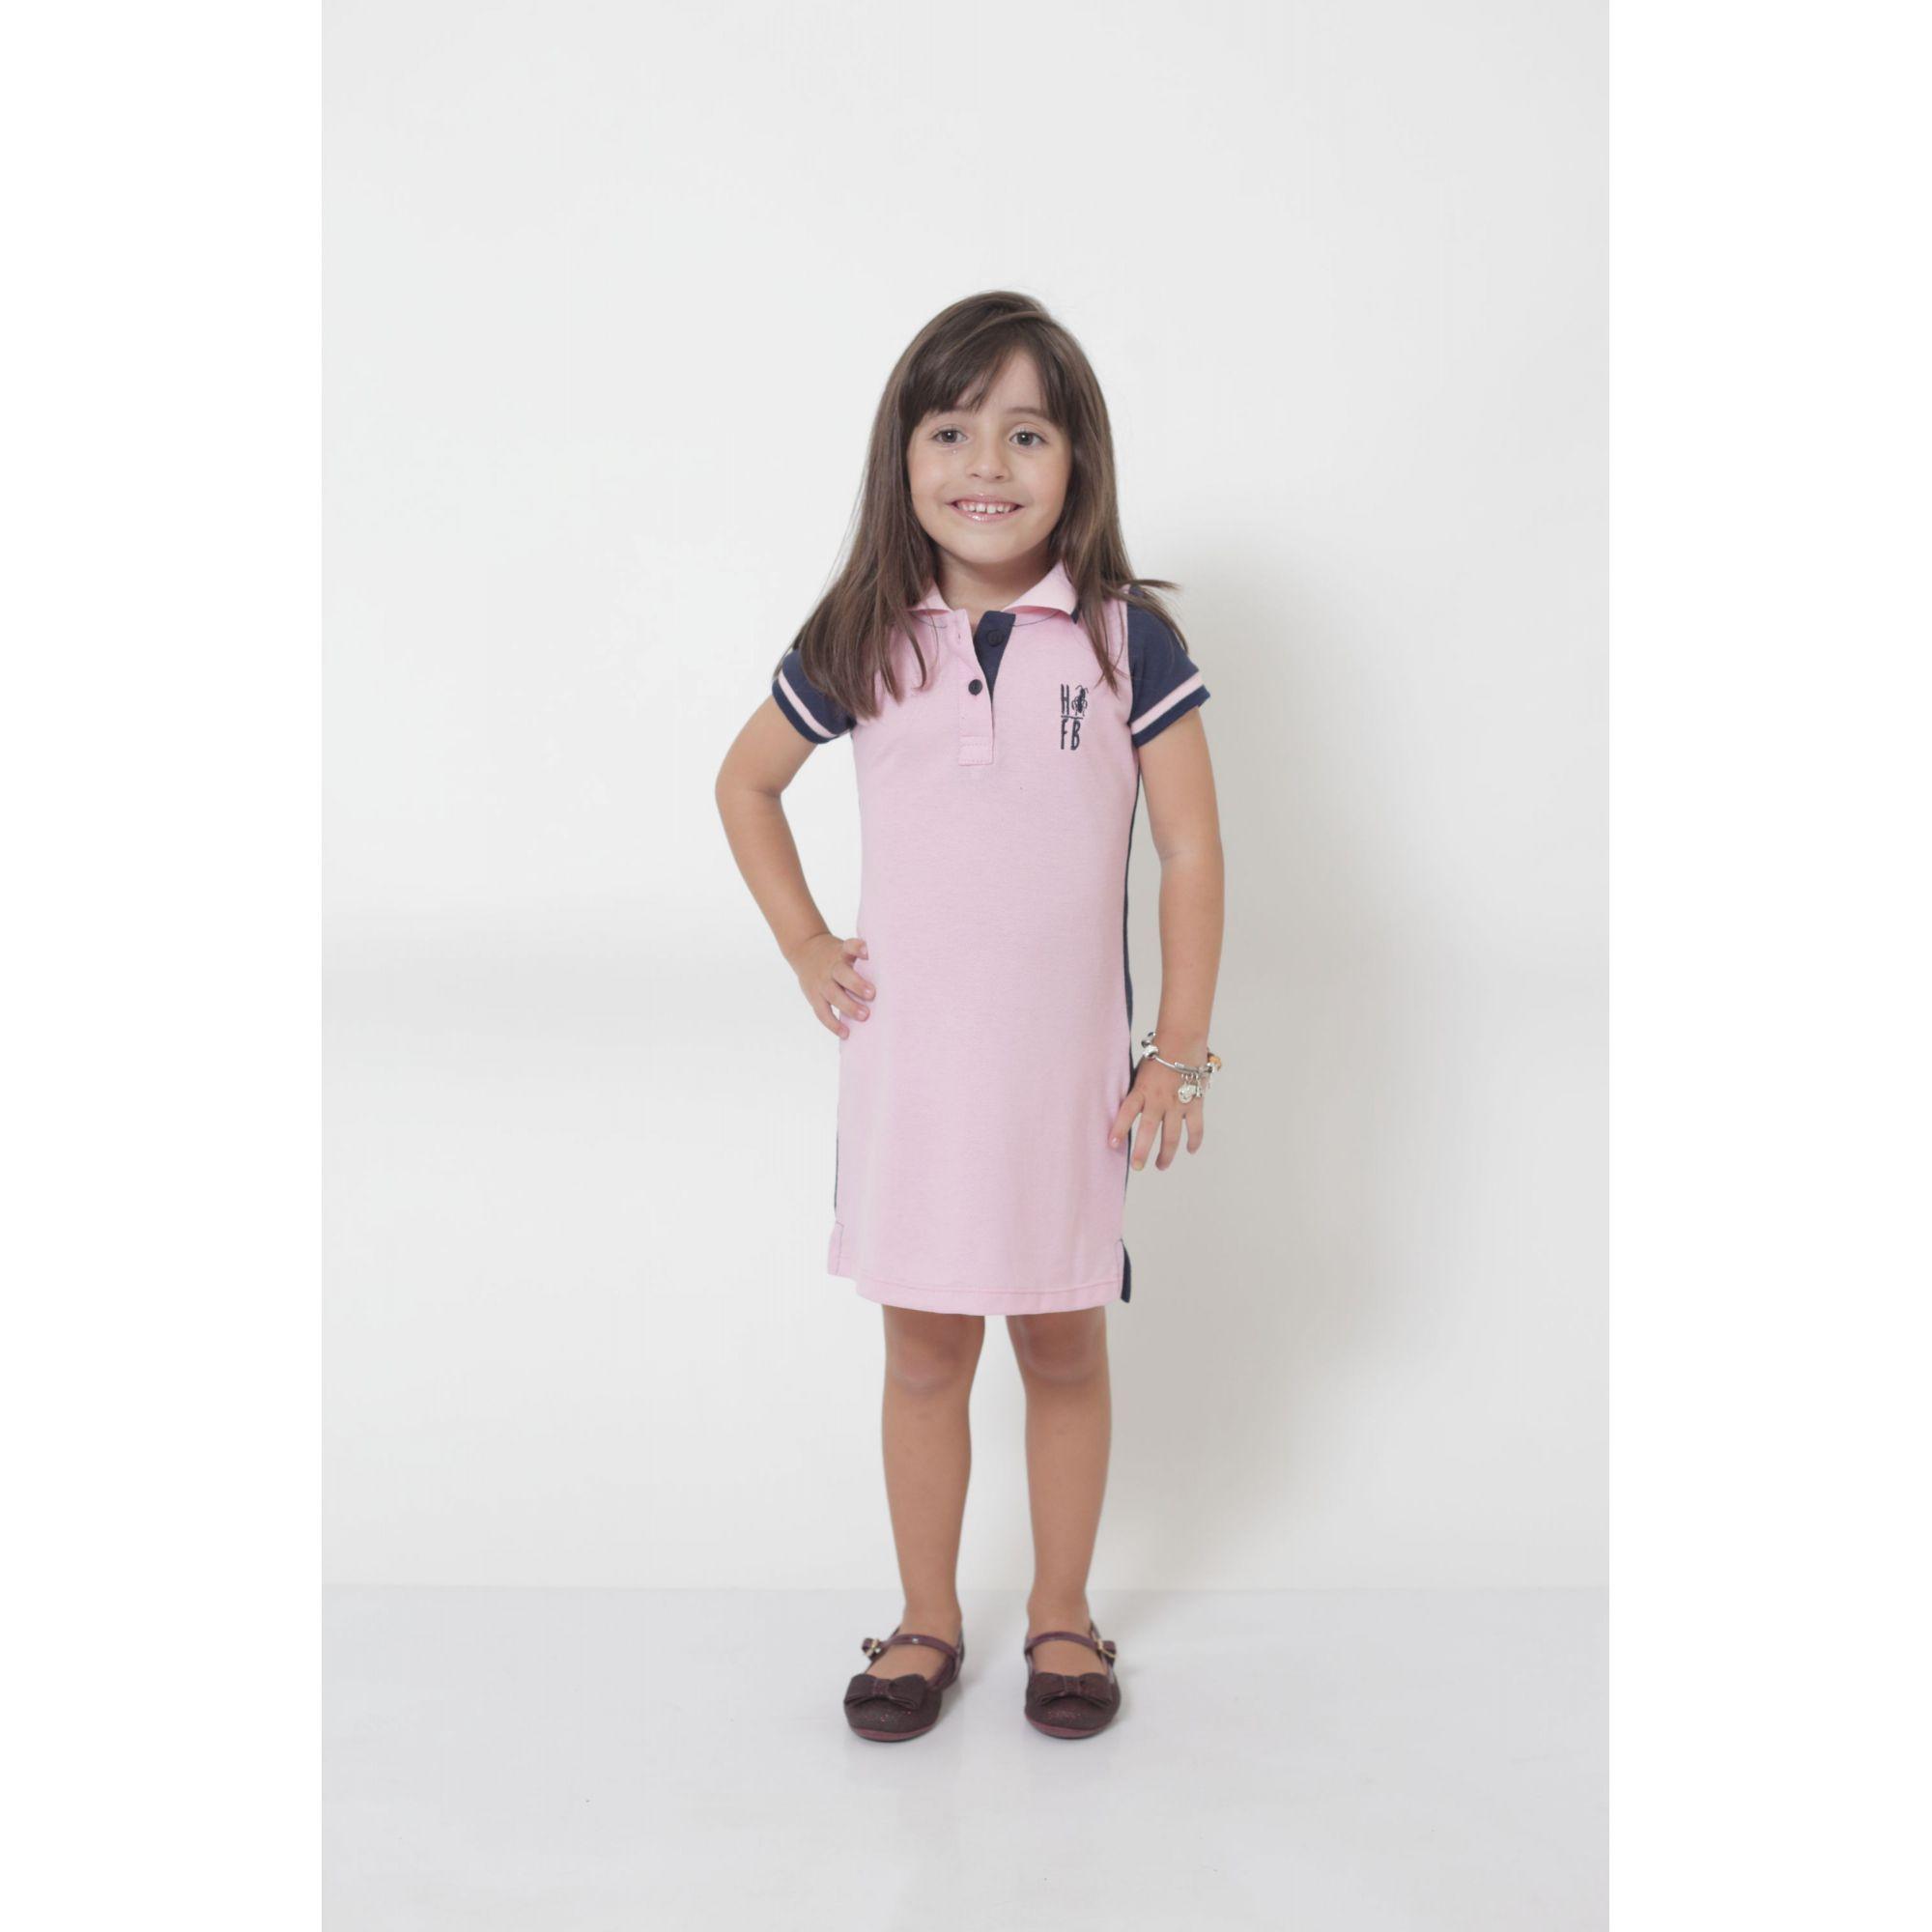 MÃE E FILHA > Kit 02 Vestidos Adulto e Infantil Dual Cor Rosa e Marinho [Coleção Tal Mãe Tal Filha]  - Heitor Fashion Brazil